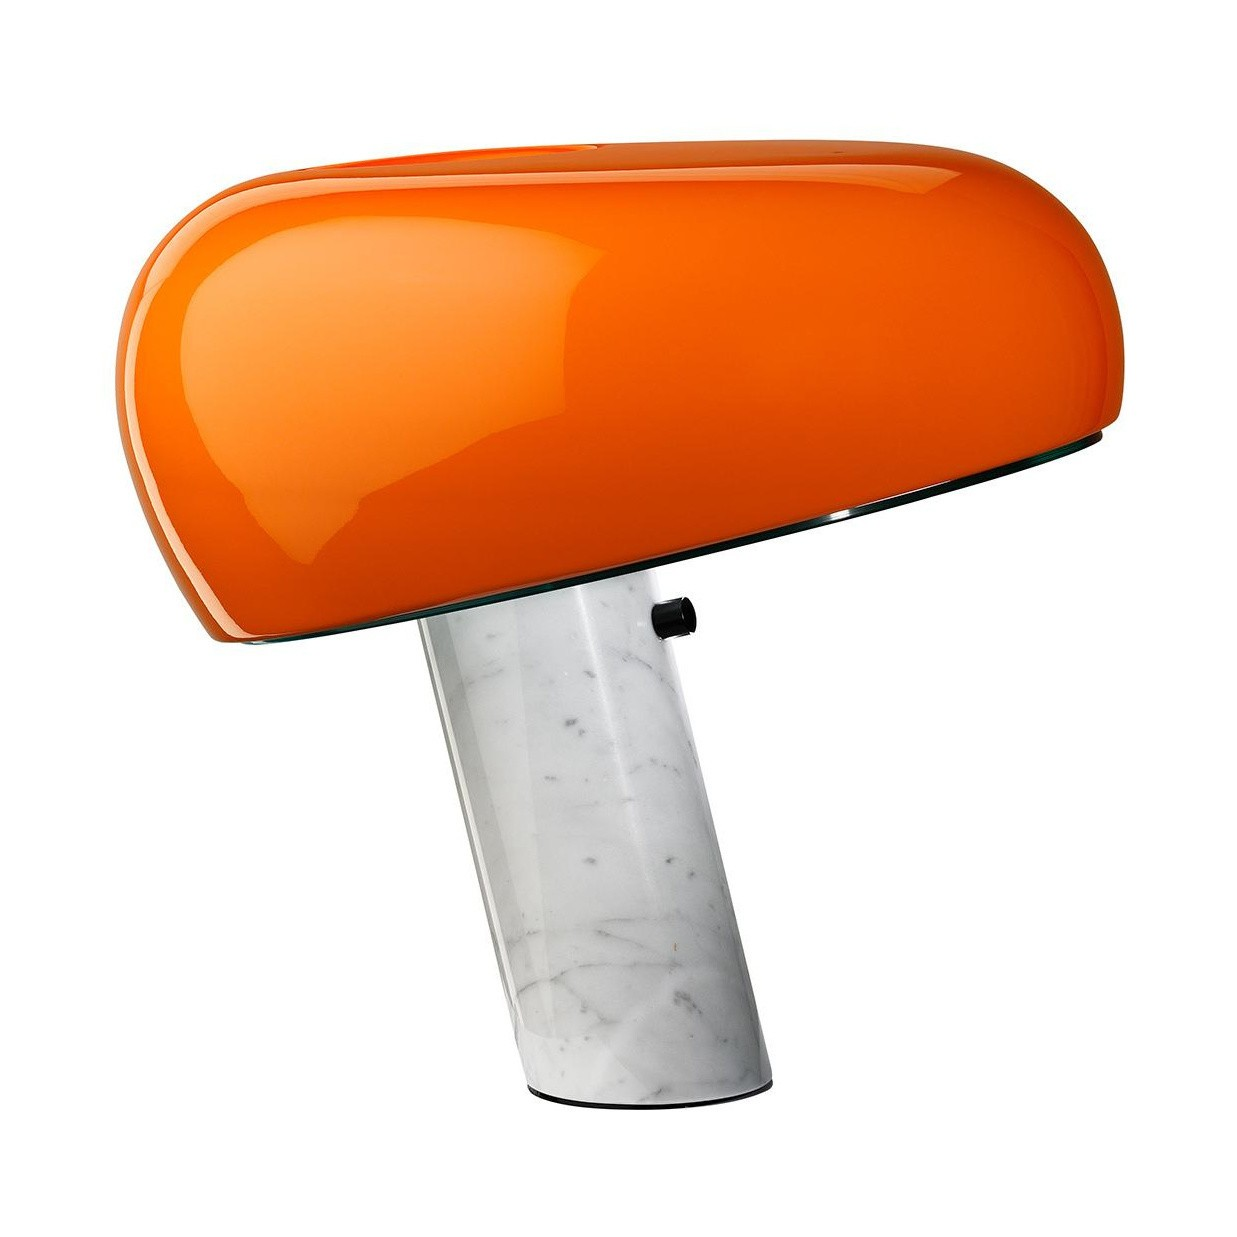 flos dition sp ciale 2017 snoopy lampe de table ambientedirect. Black Bedroom Furniture Sets. Home Design Ideas